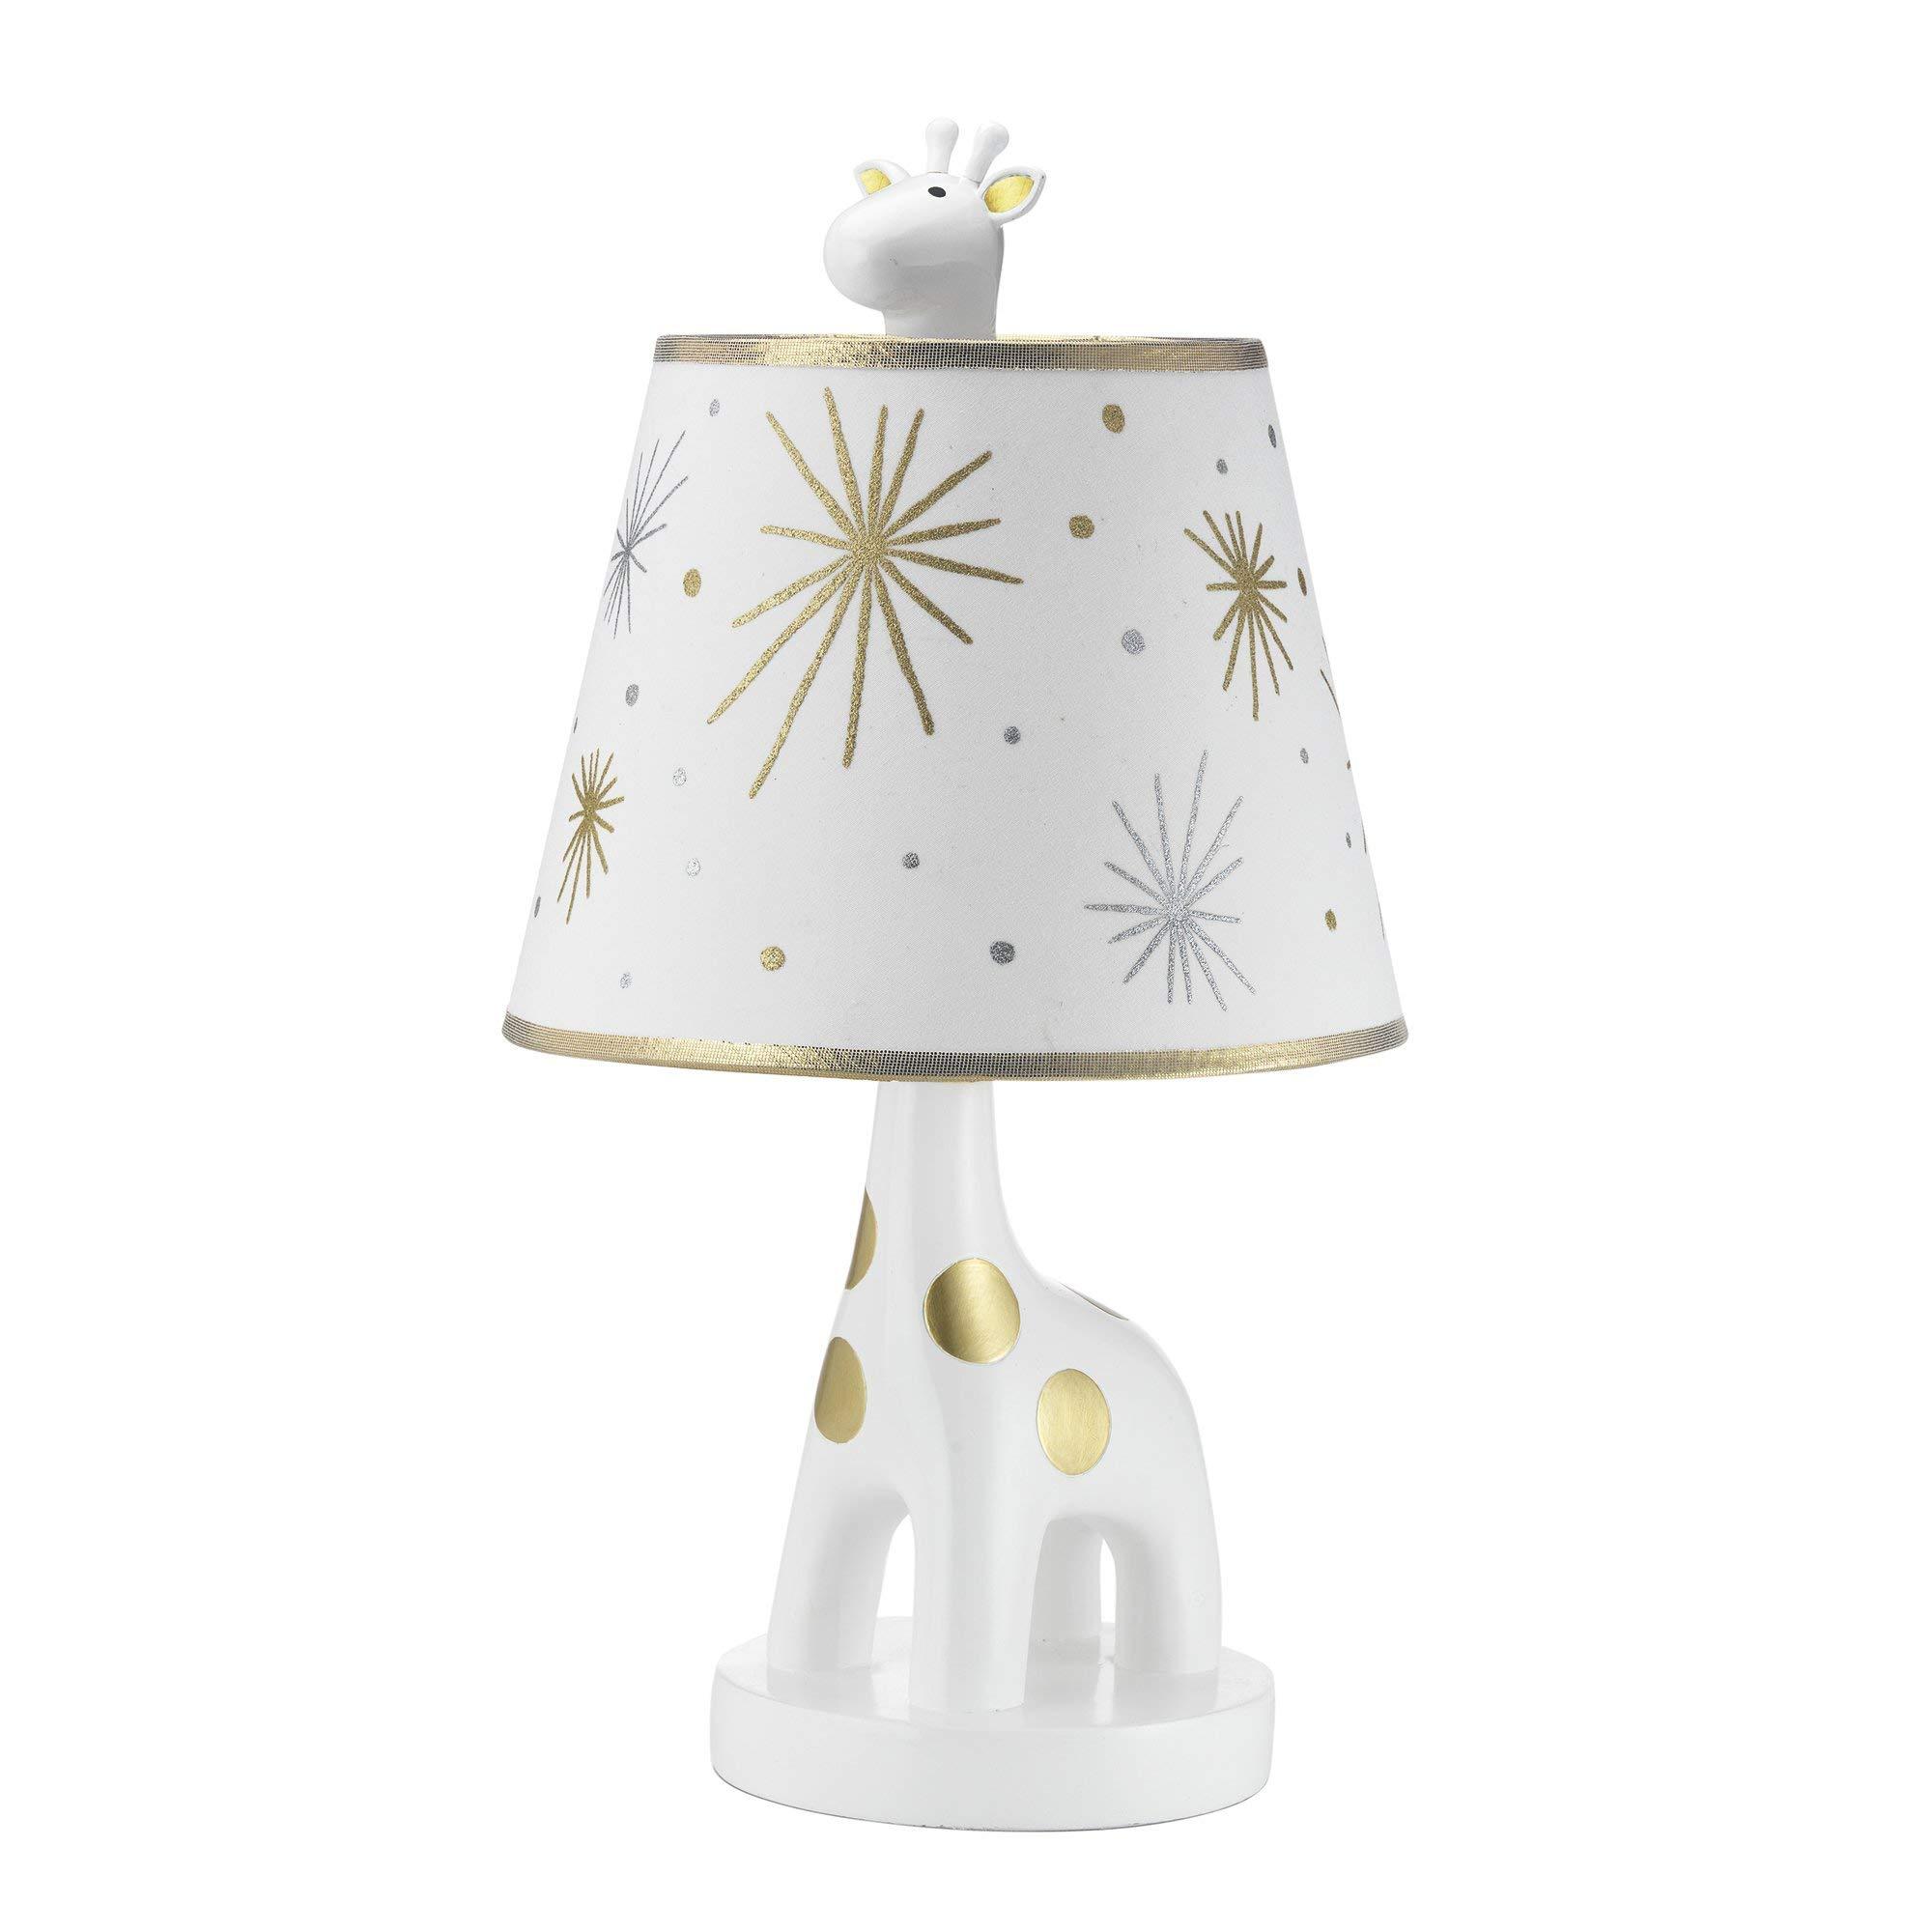 Lambs & Ivy Signature Moonbeams Lamp with Shade & Bulb - Gold, White, Animals